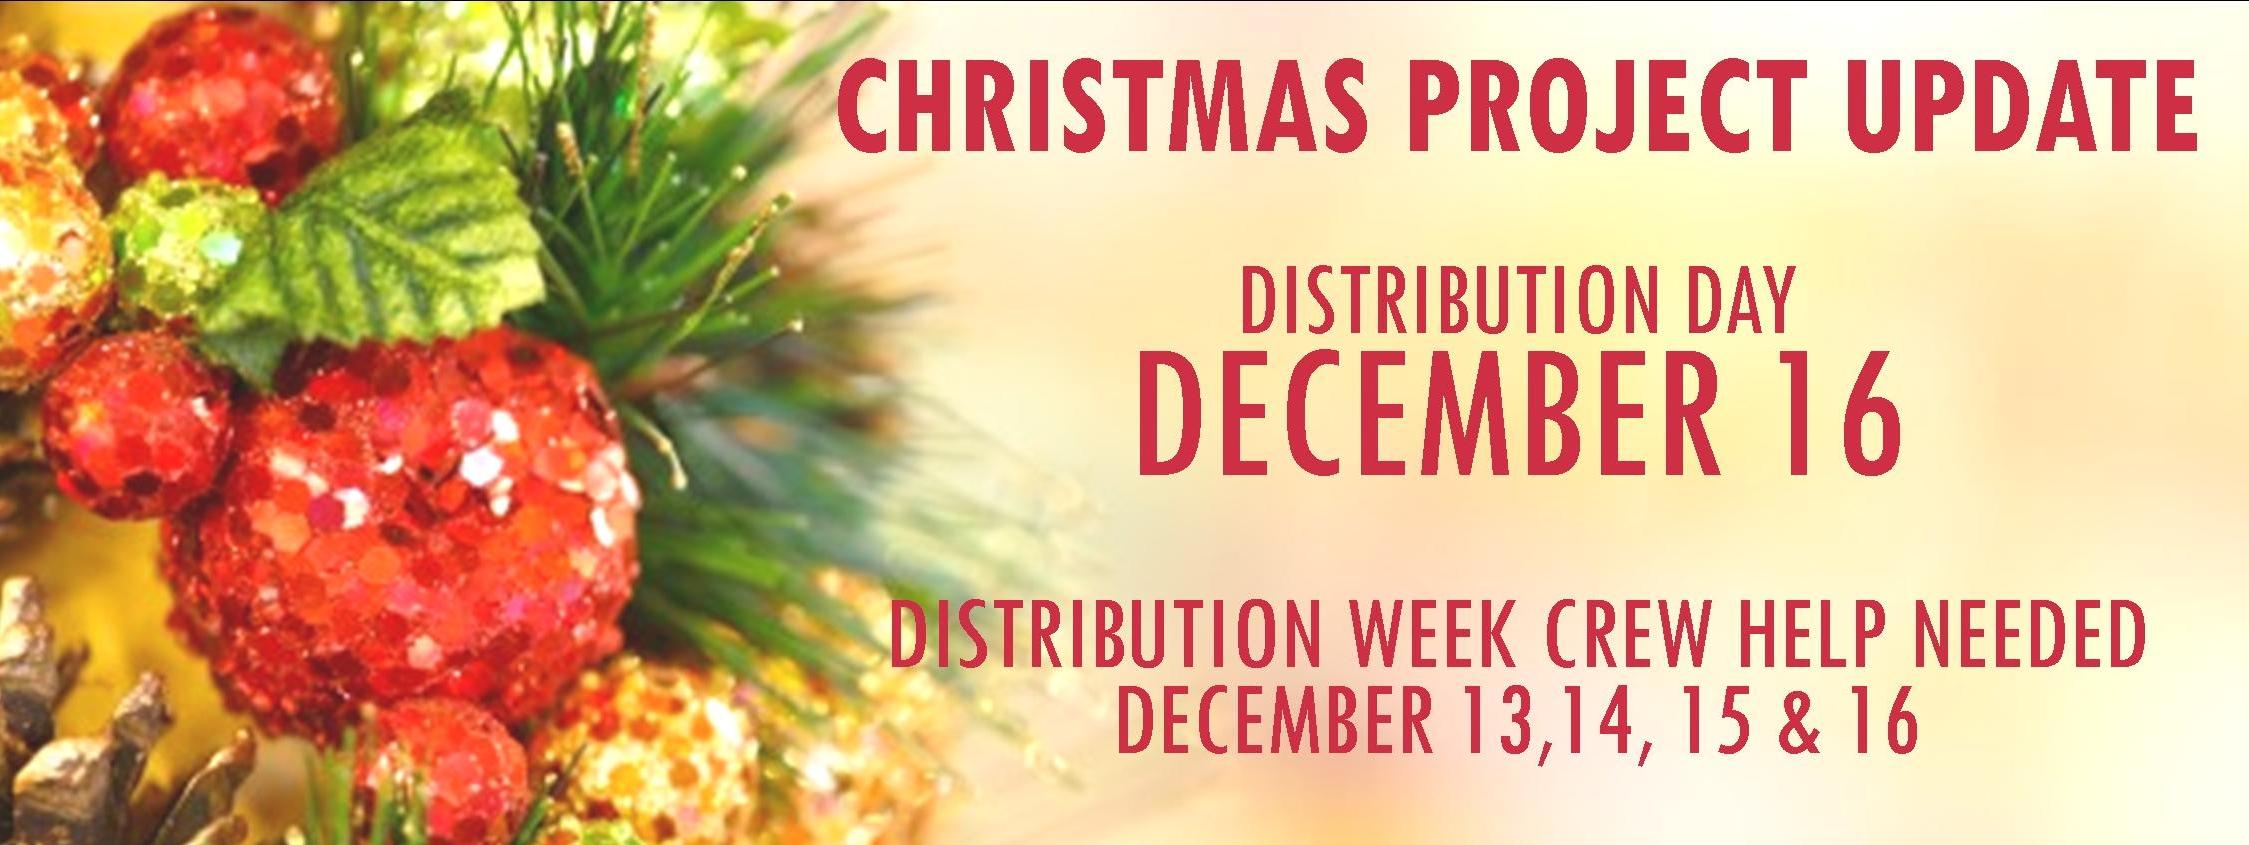 Christmas project update 121317.jpg